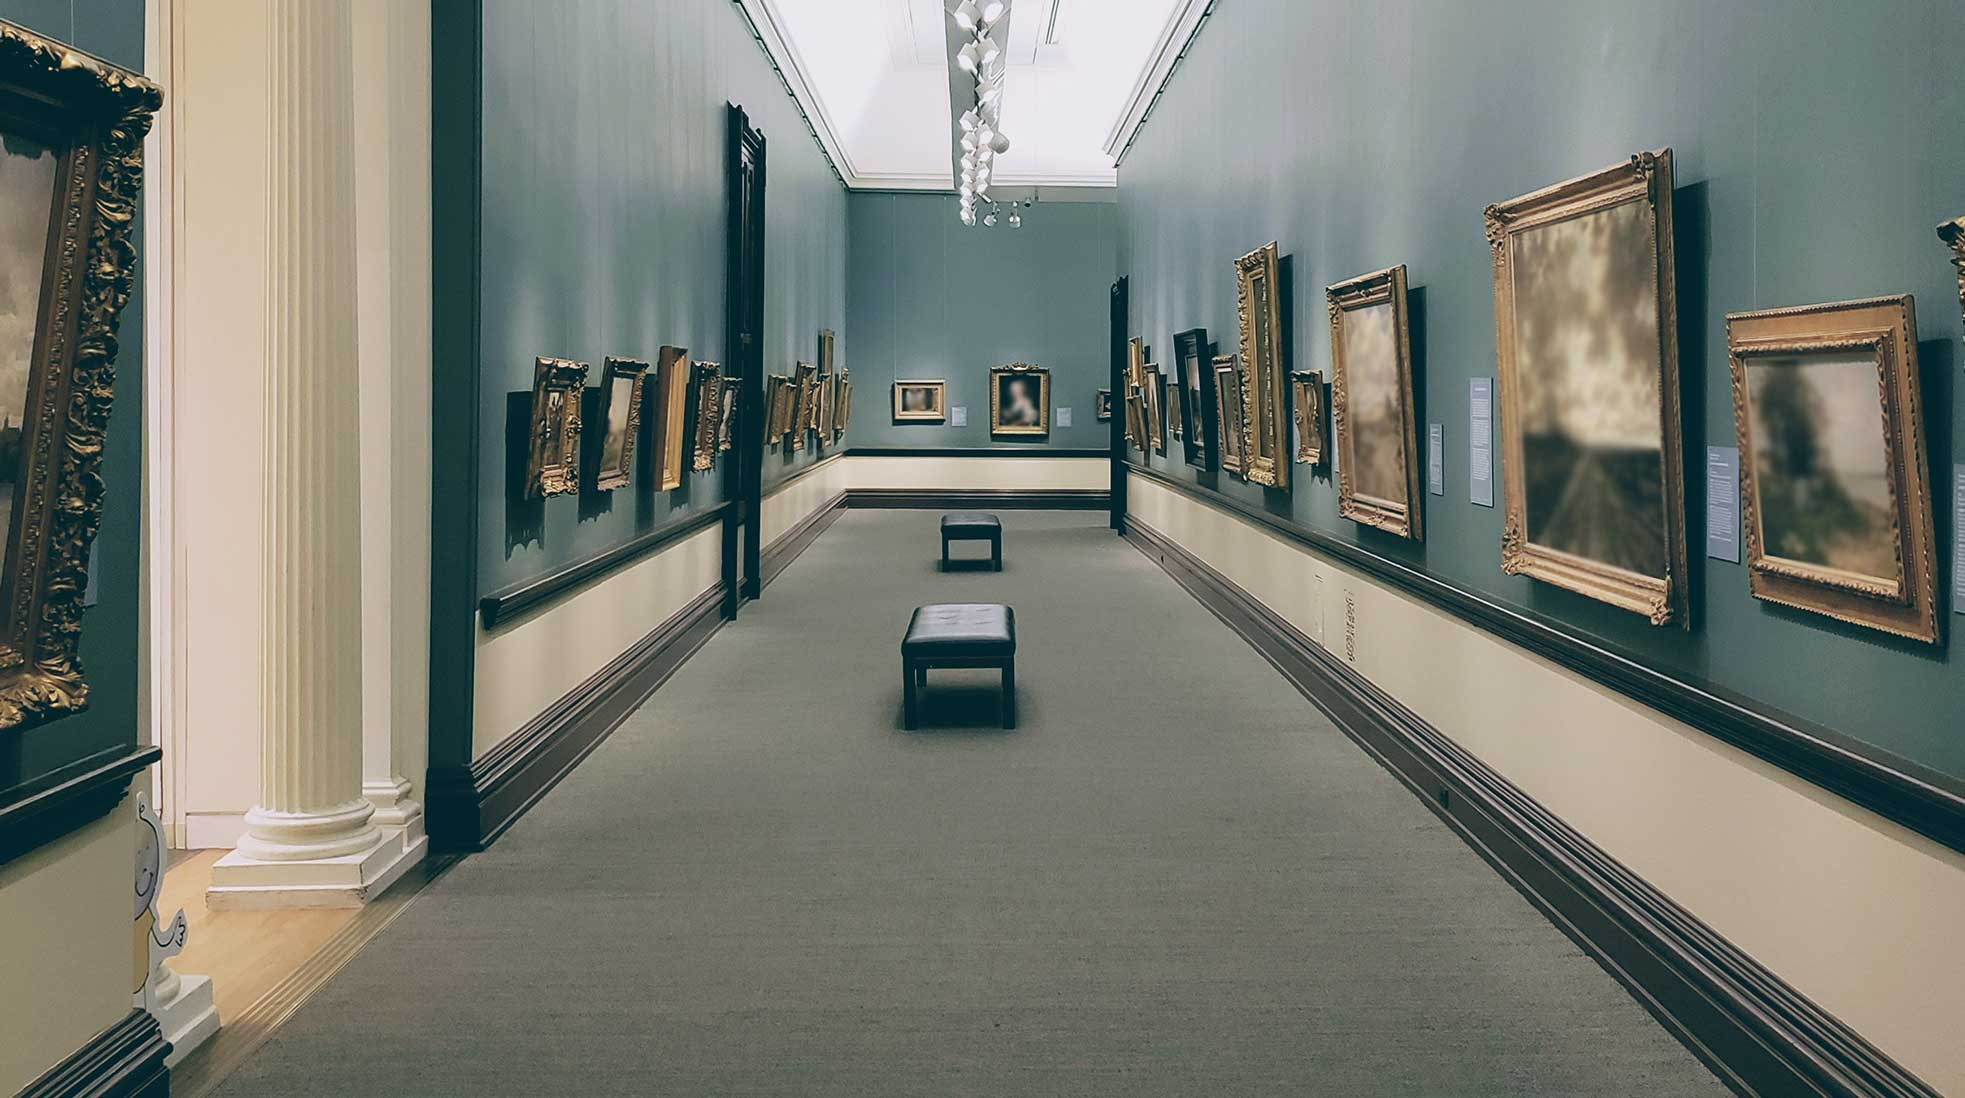 Art gallery. Photo: Bahman Adlou / Unsplash